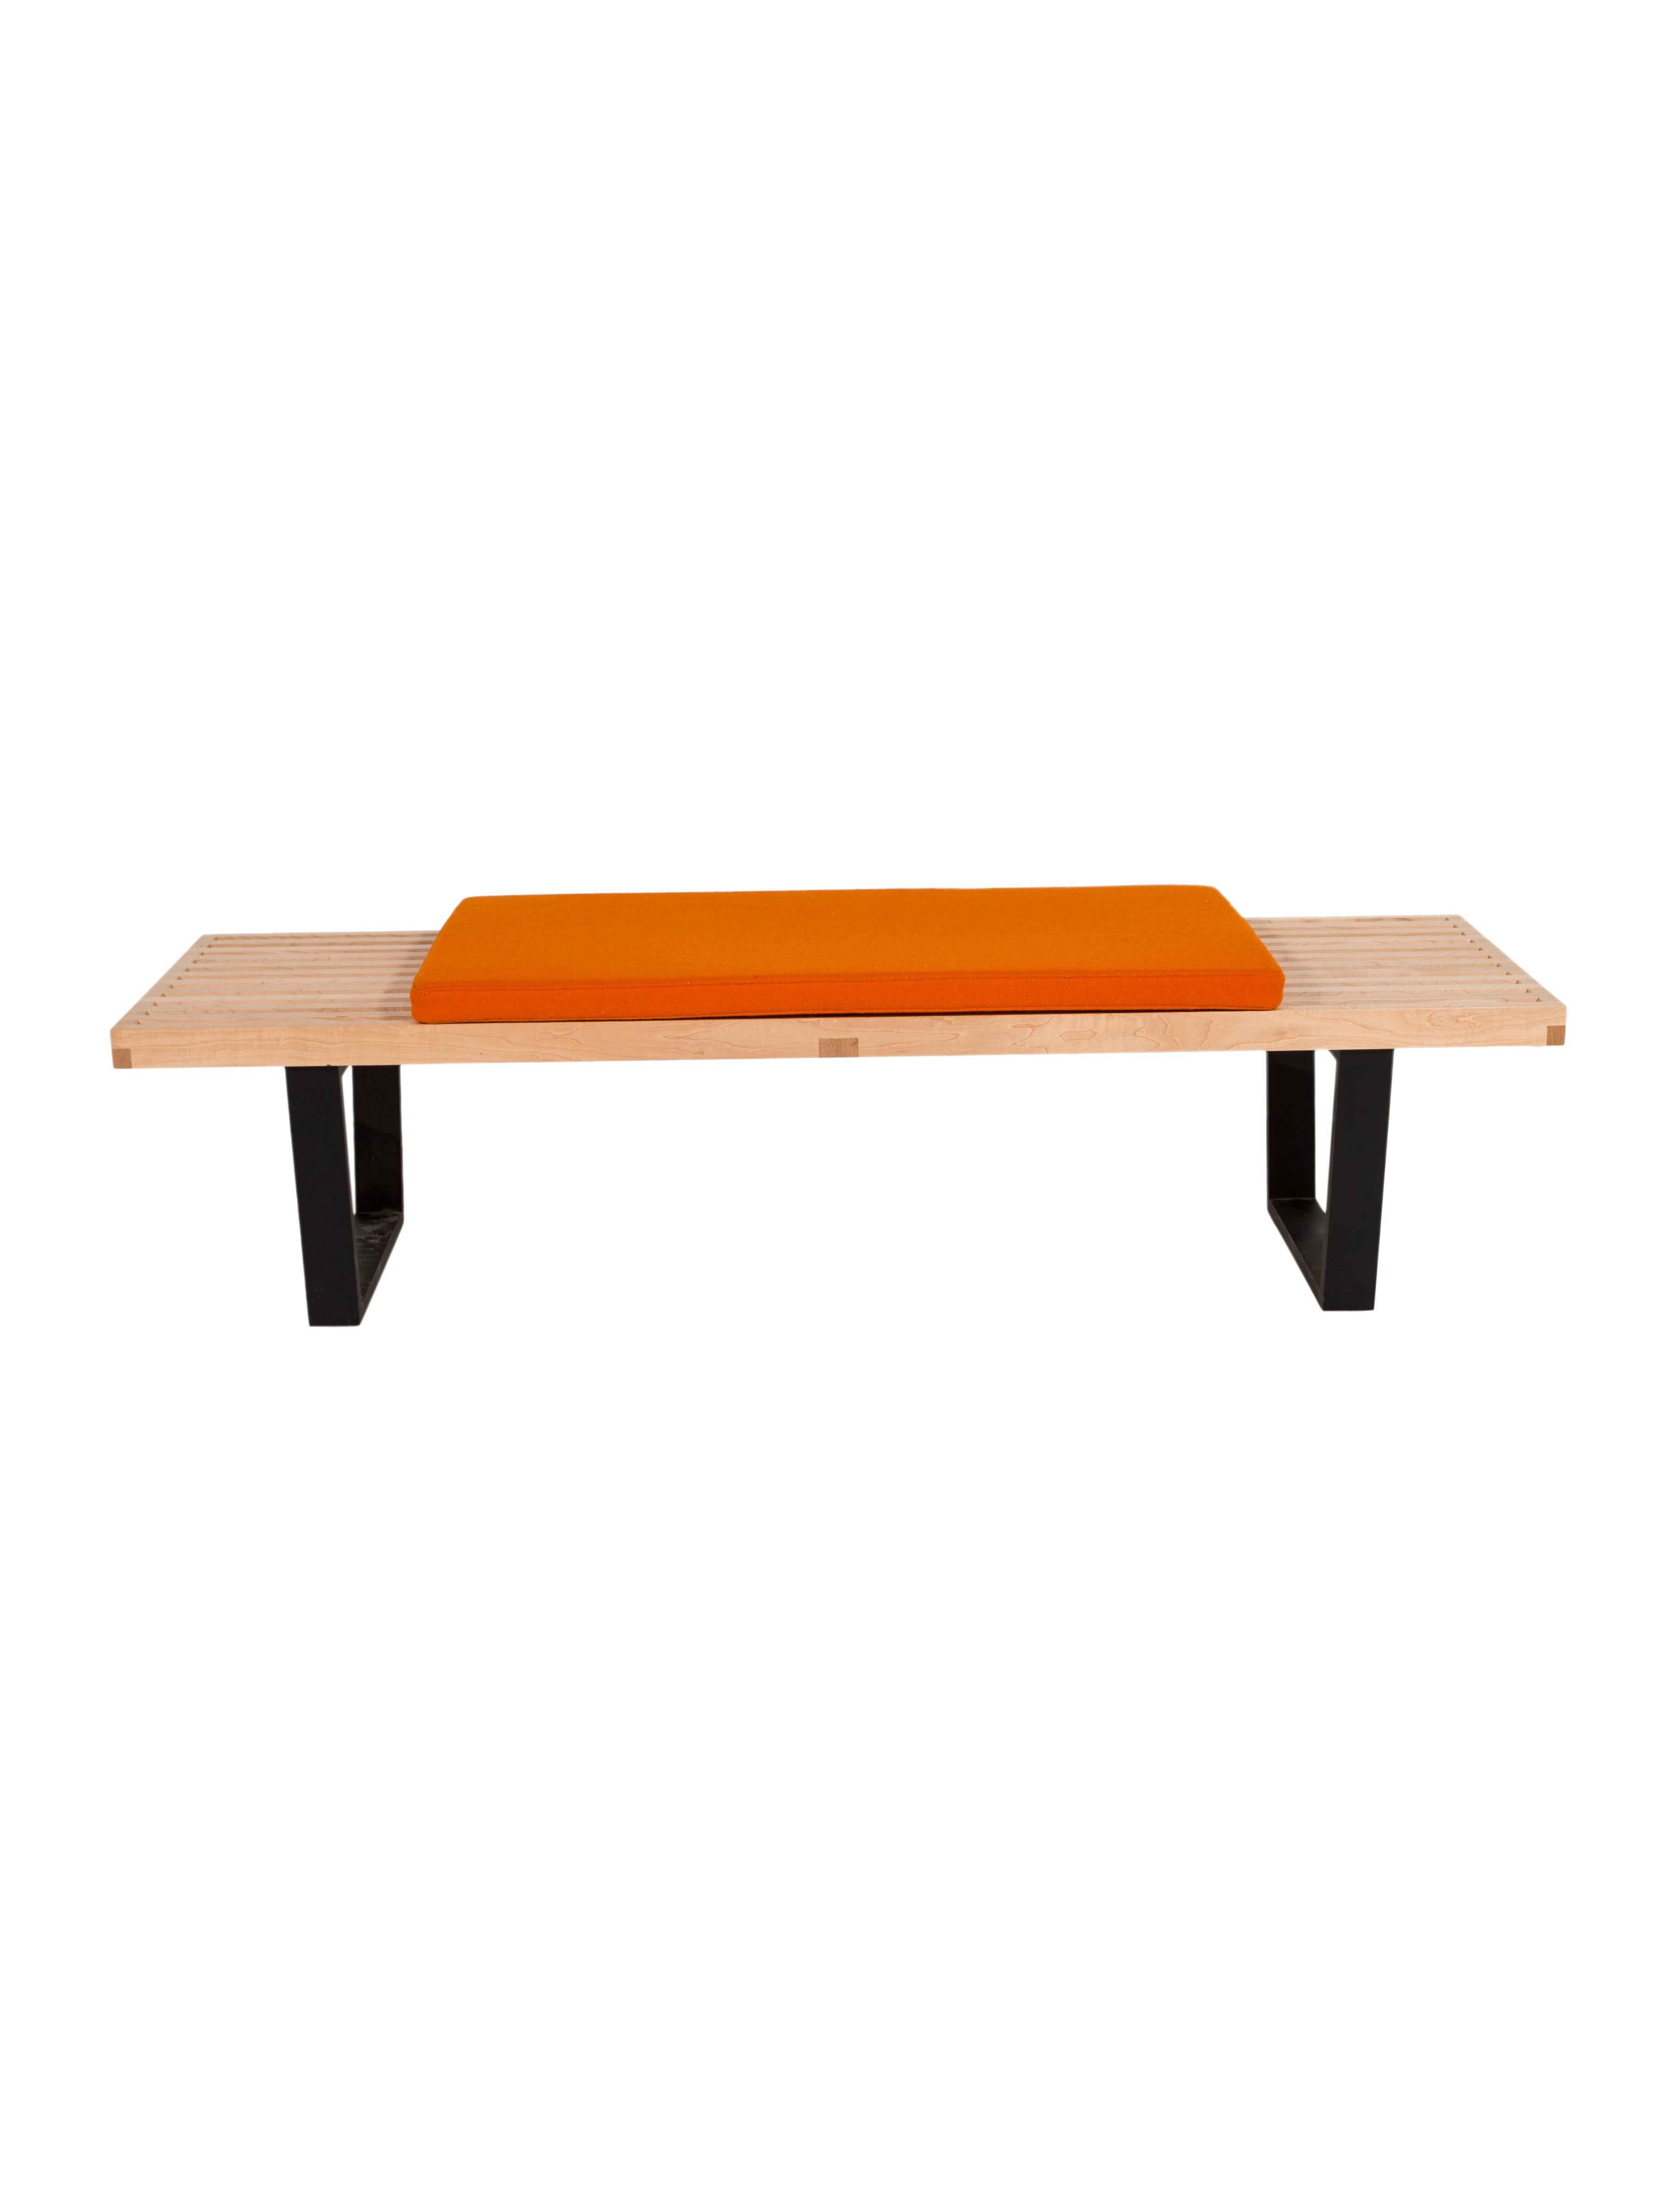 top herman escritorios y expand miller mesas productos design collection table avive bench en